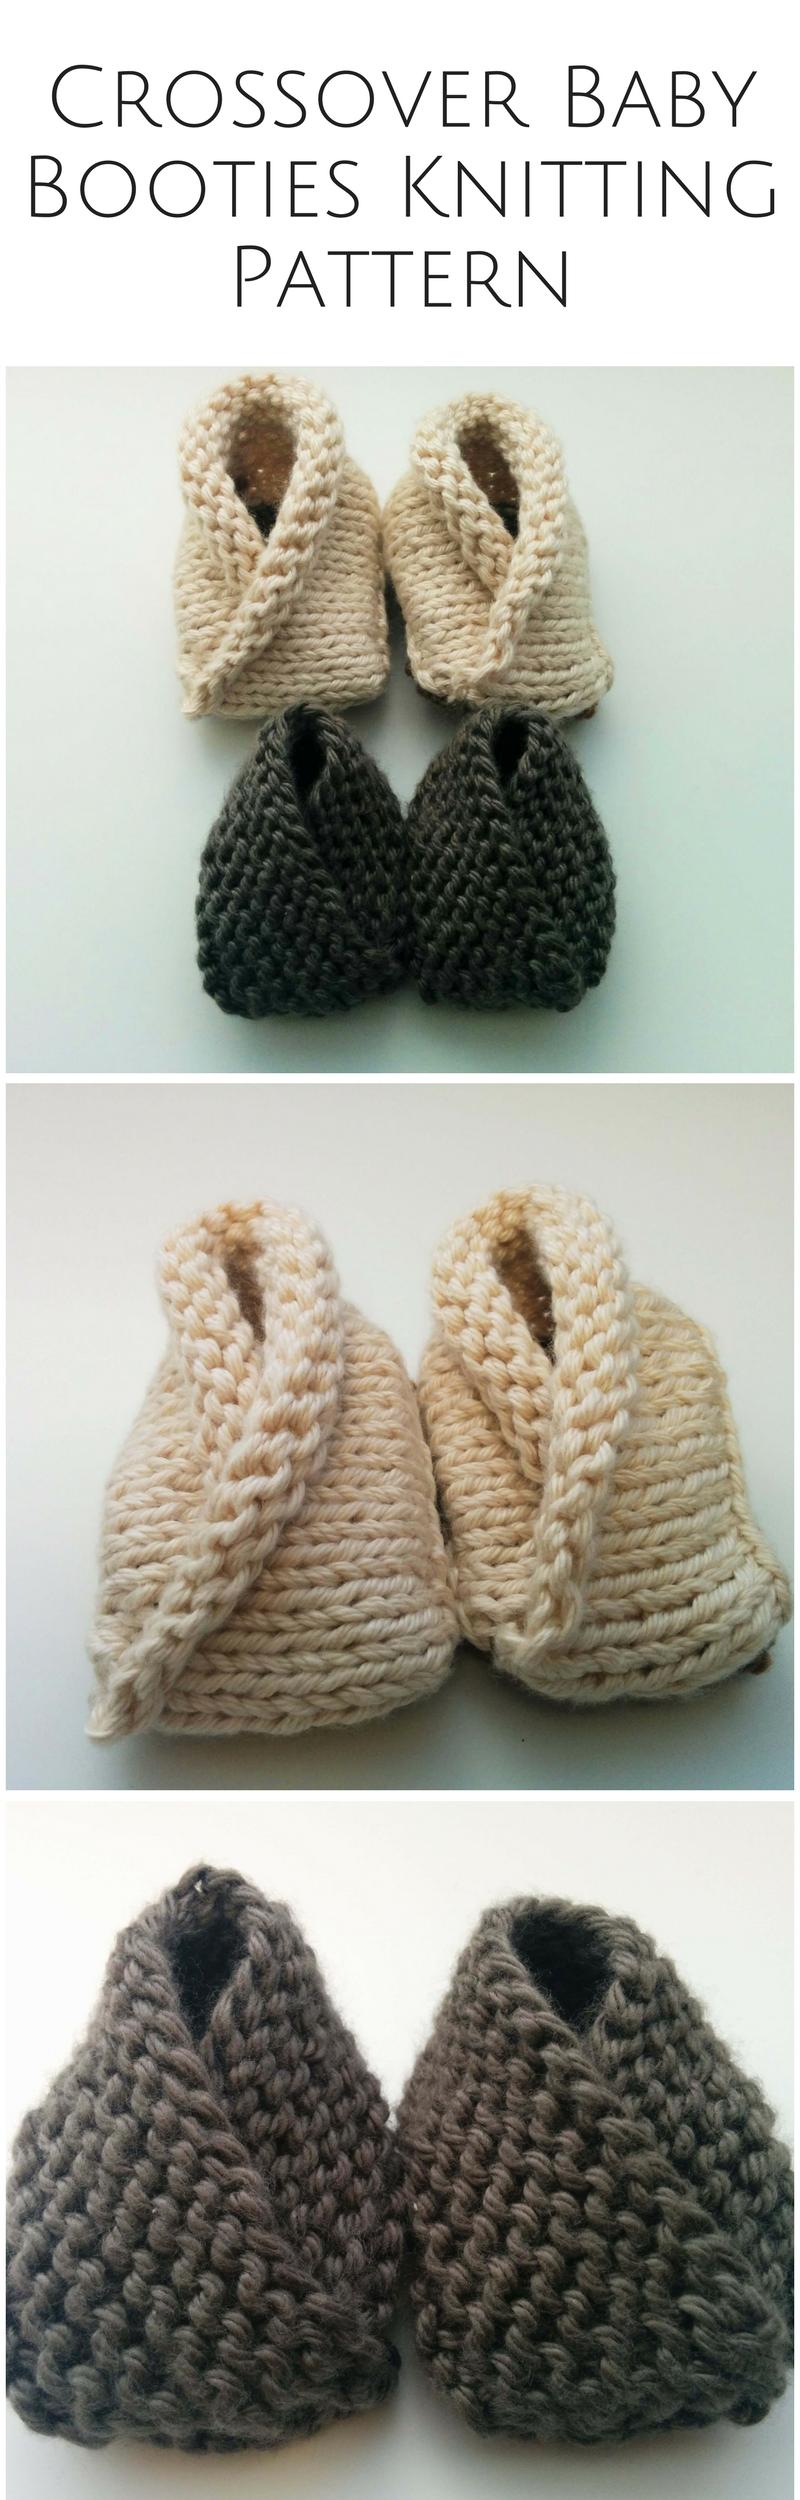 Pin by Talita Smit on Crochet Stitches Pinterest